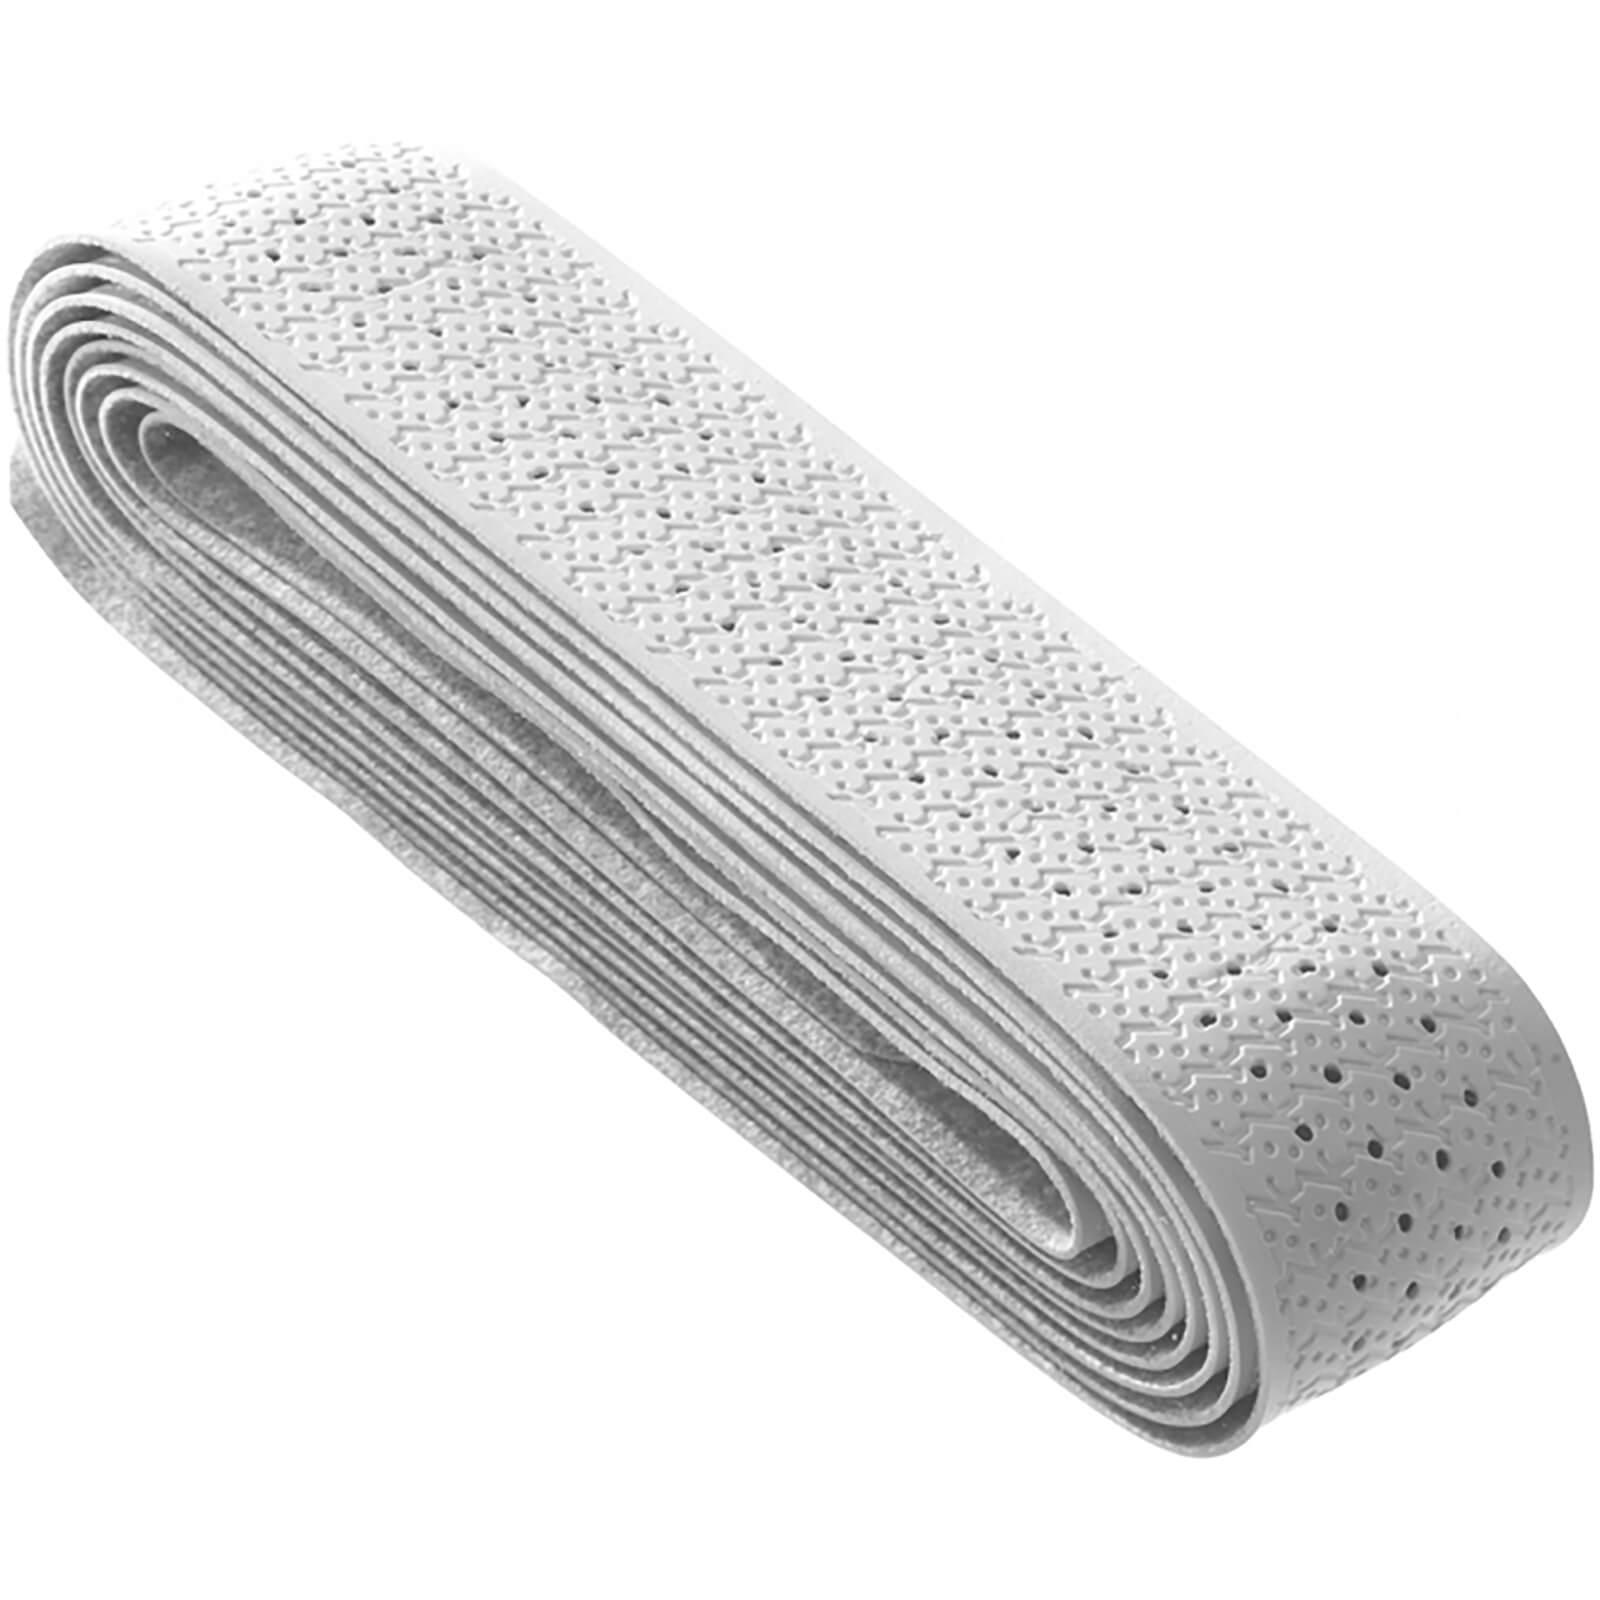 Fizik Superlight Tacky Touch 2mm Cycling Bar Tape White New